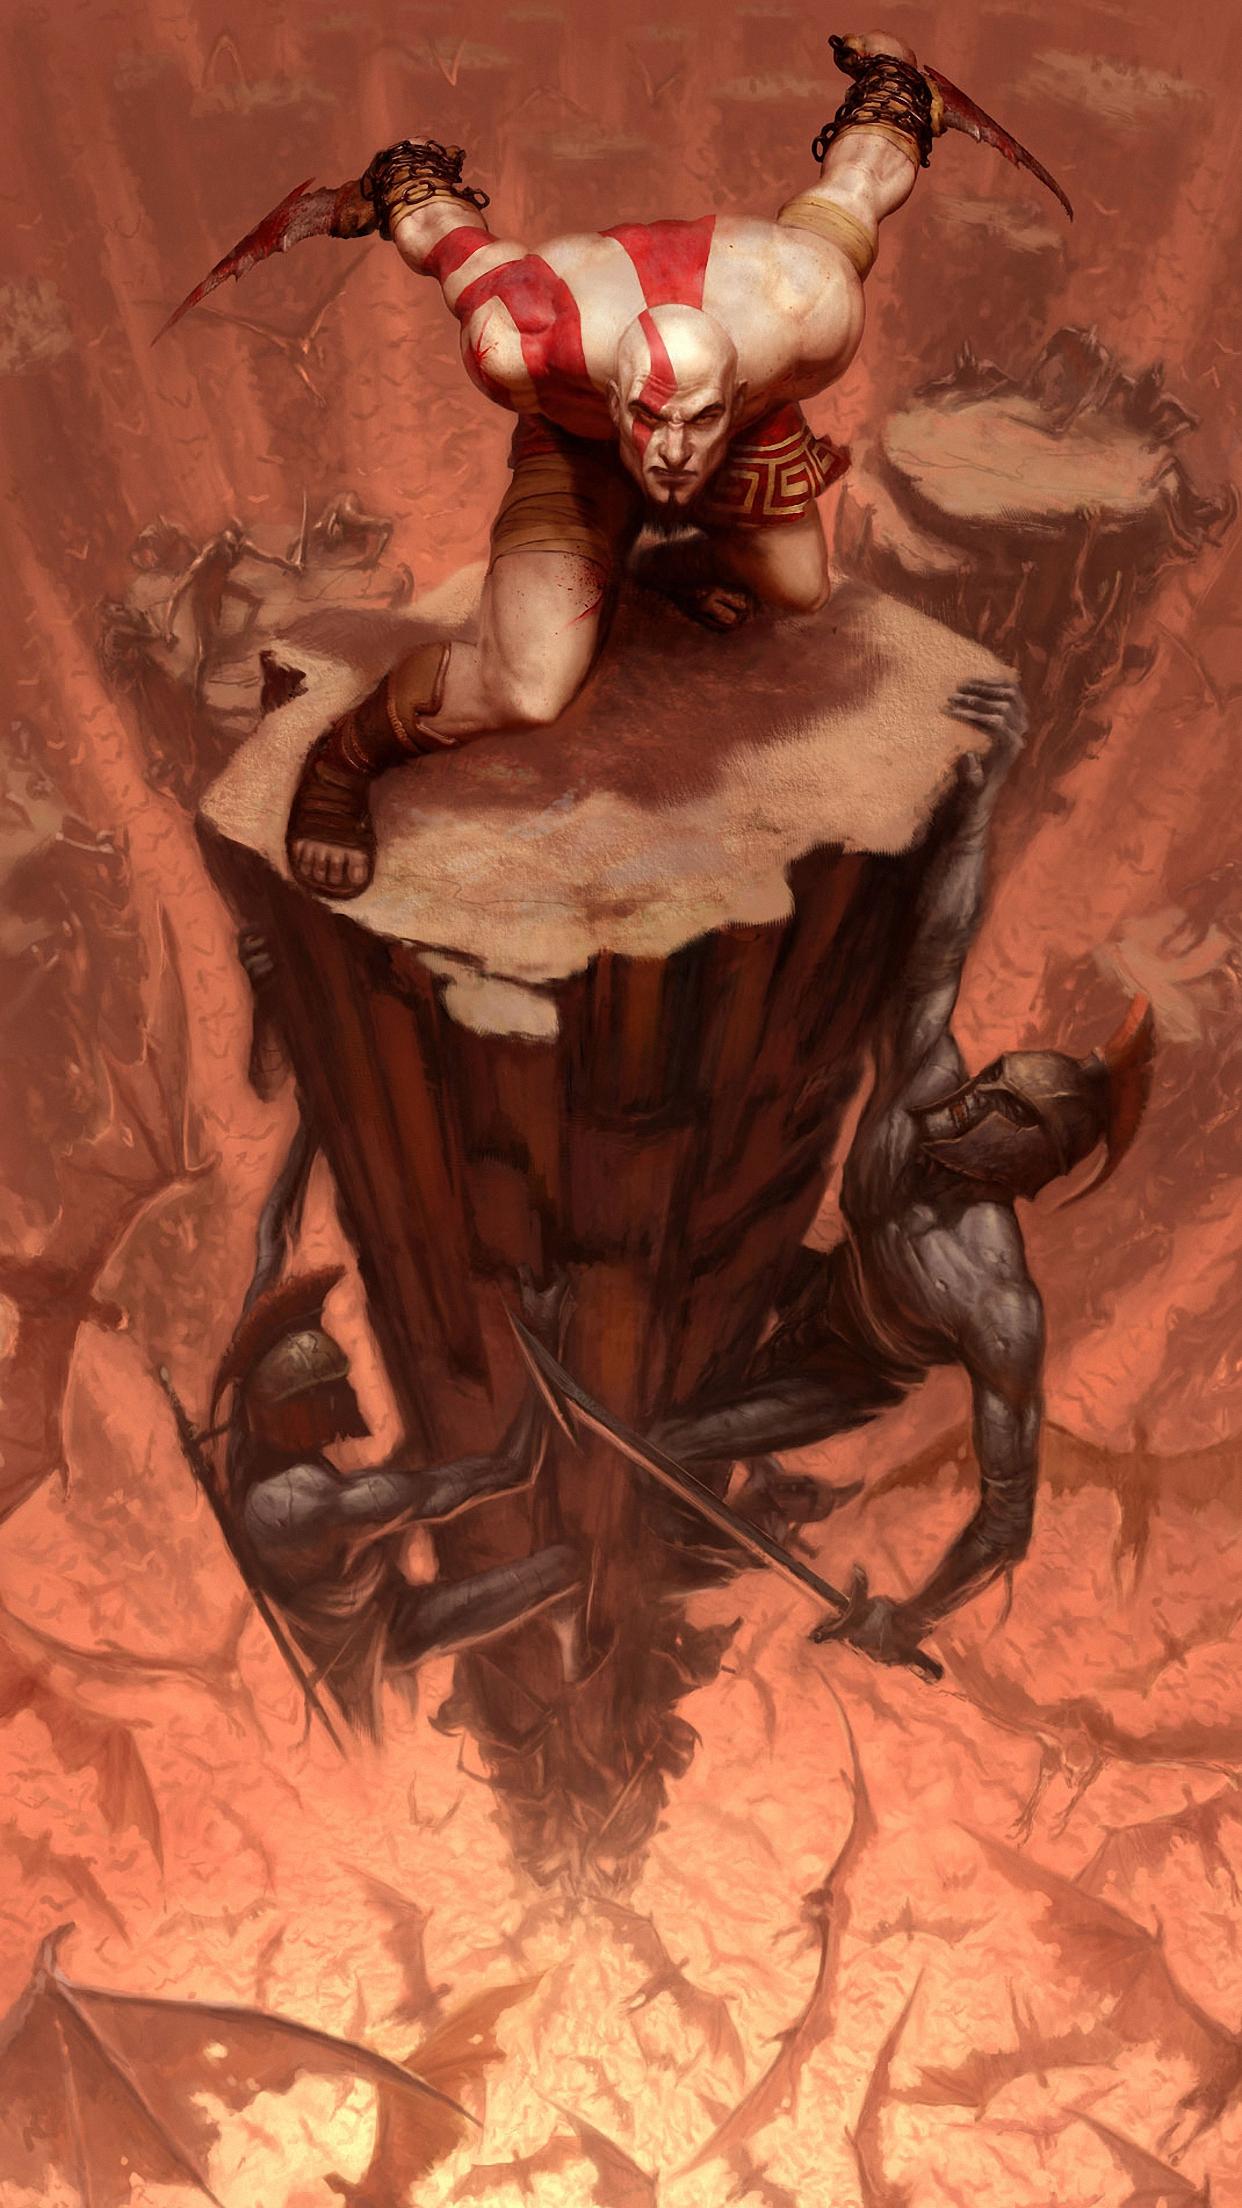 God Of War Kratos Wallpaper For Iphone X 8 7 6 Free